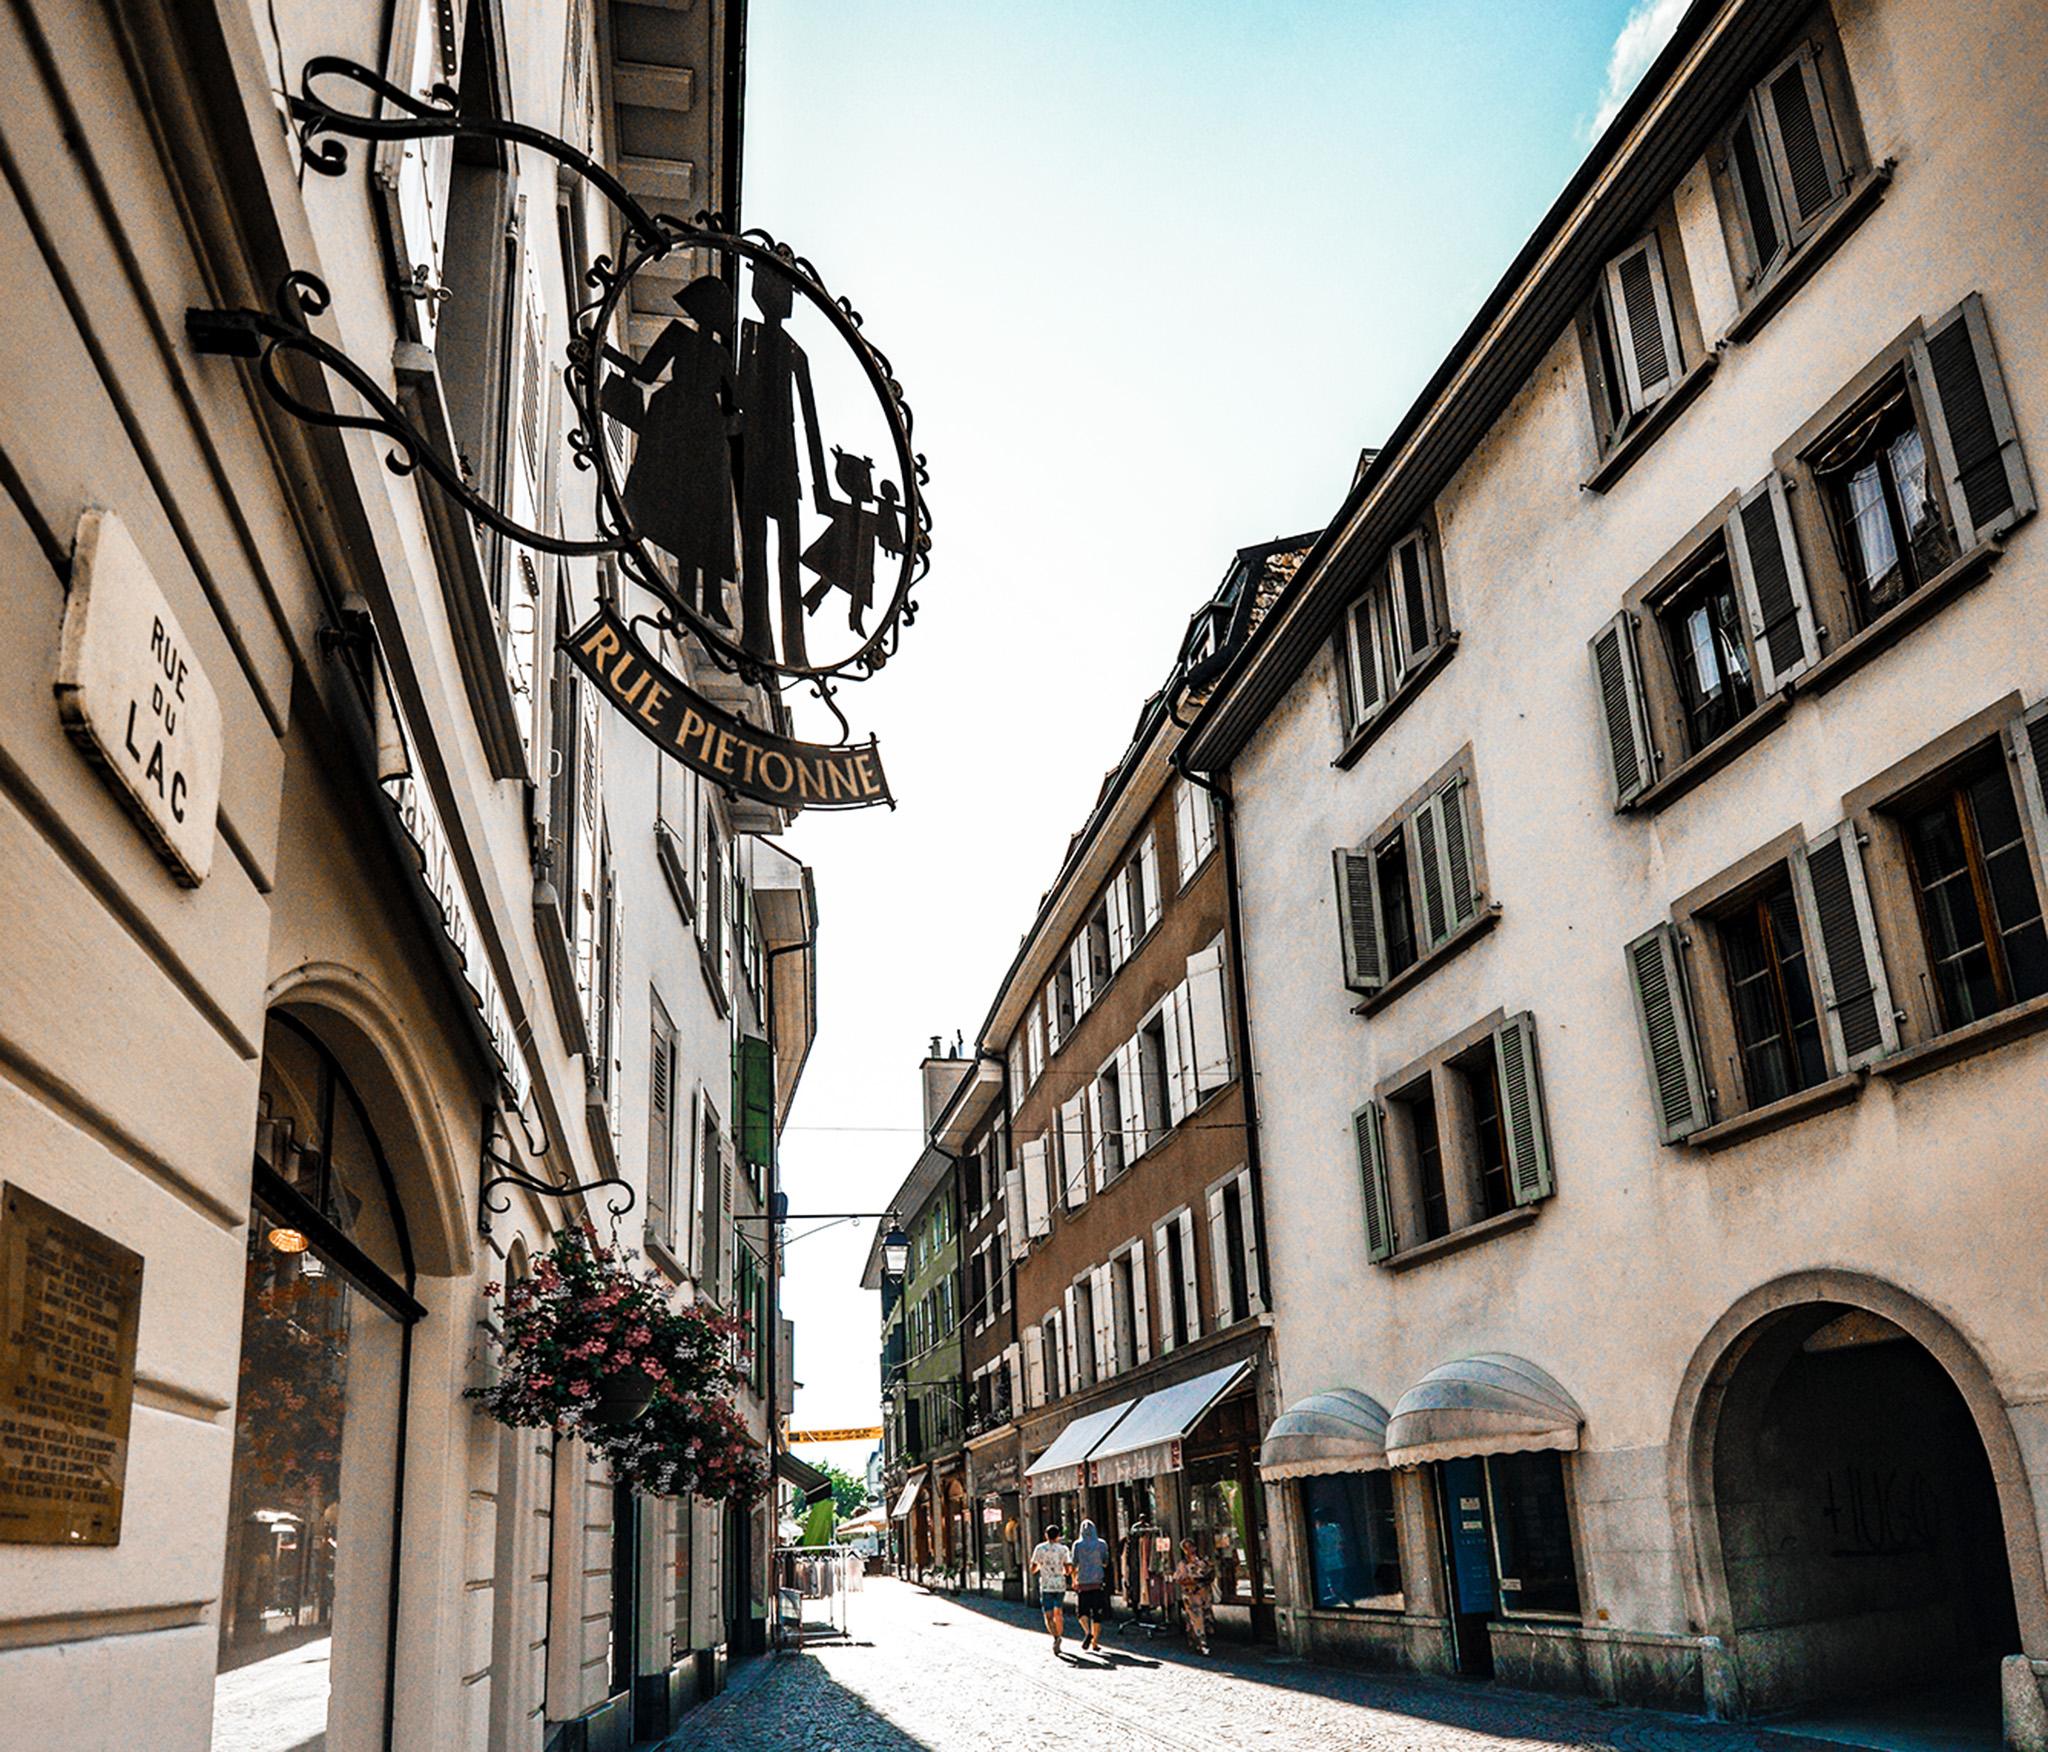 kt_2020_300_Keytours_excursions_Swisstours_vevey-city3_2048_10